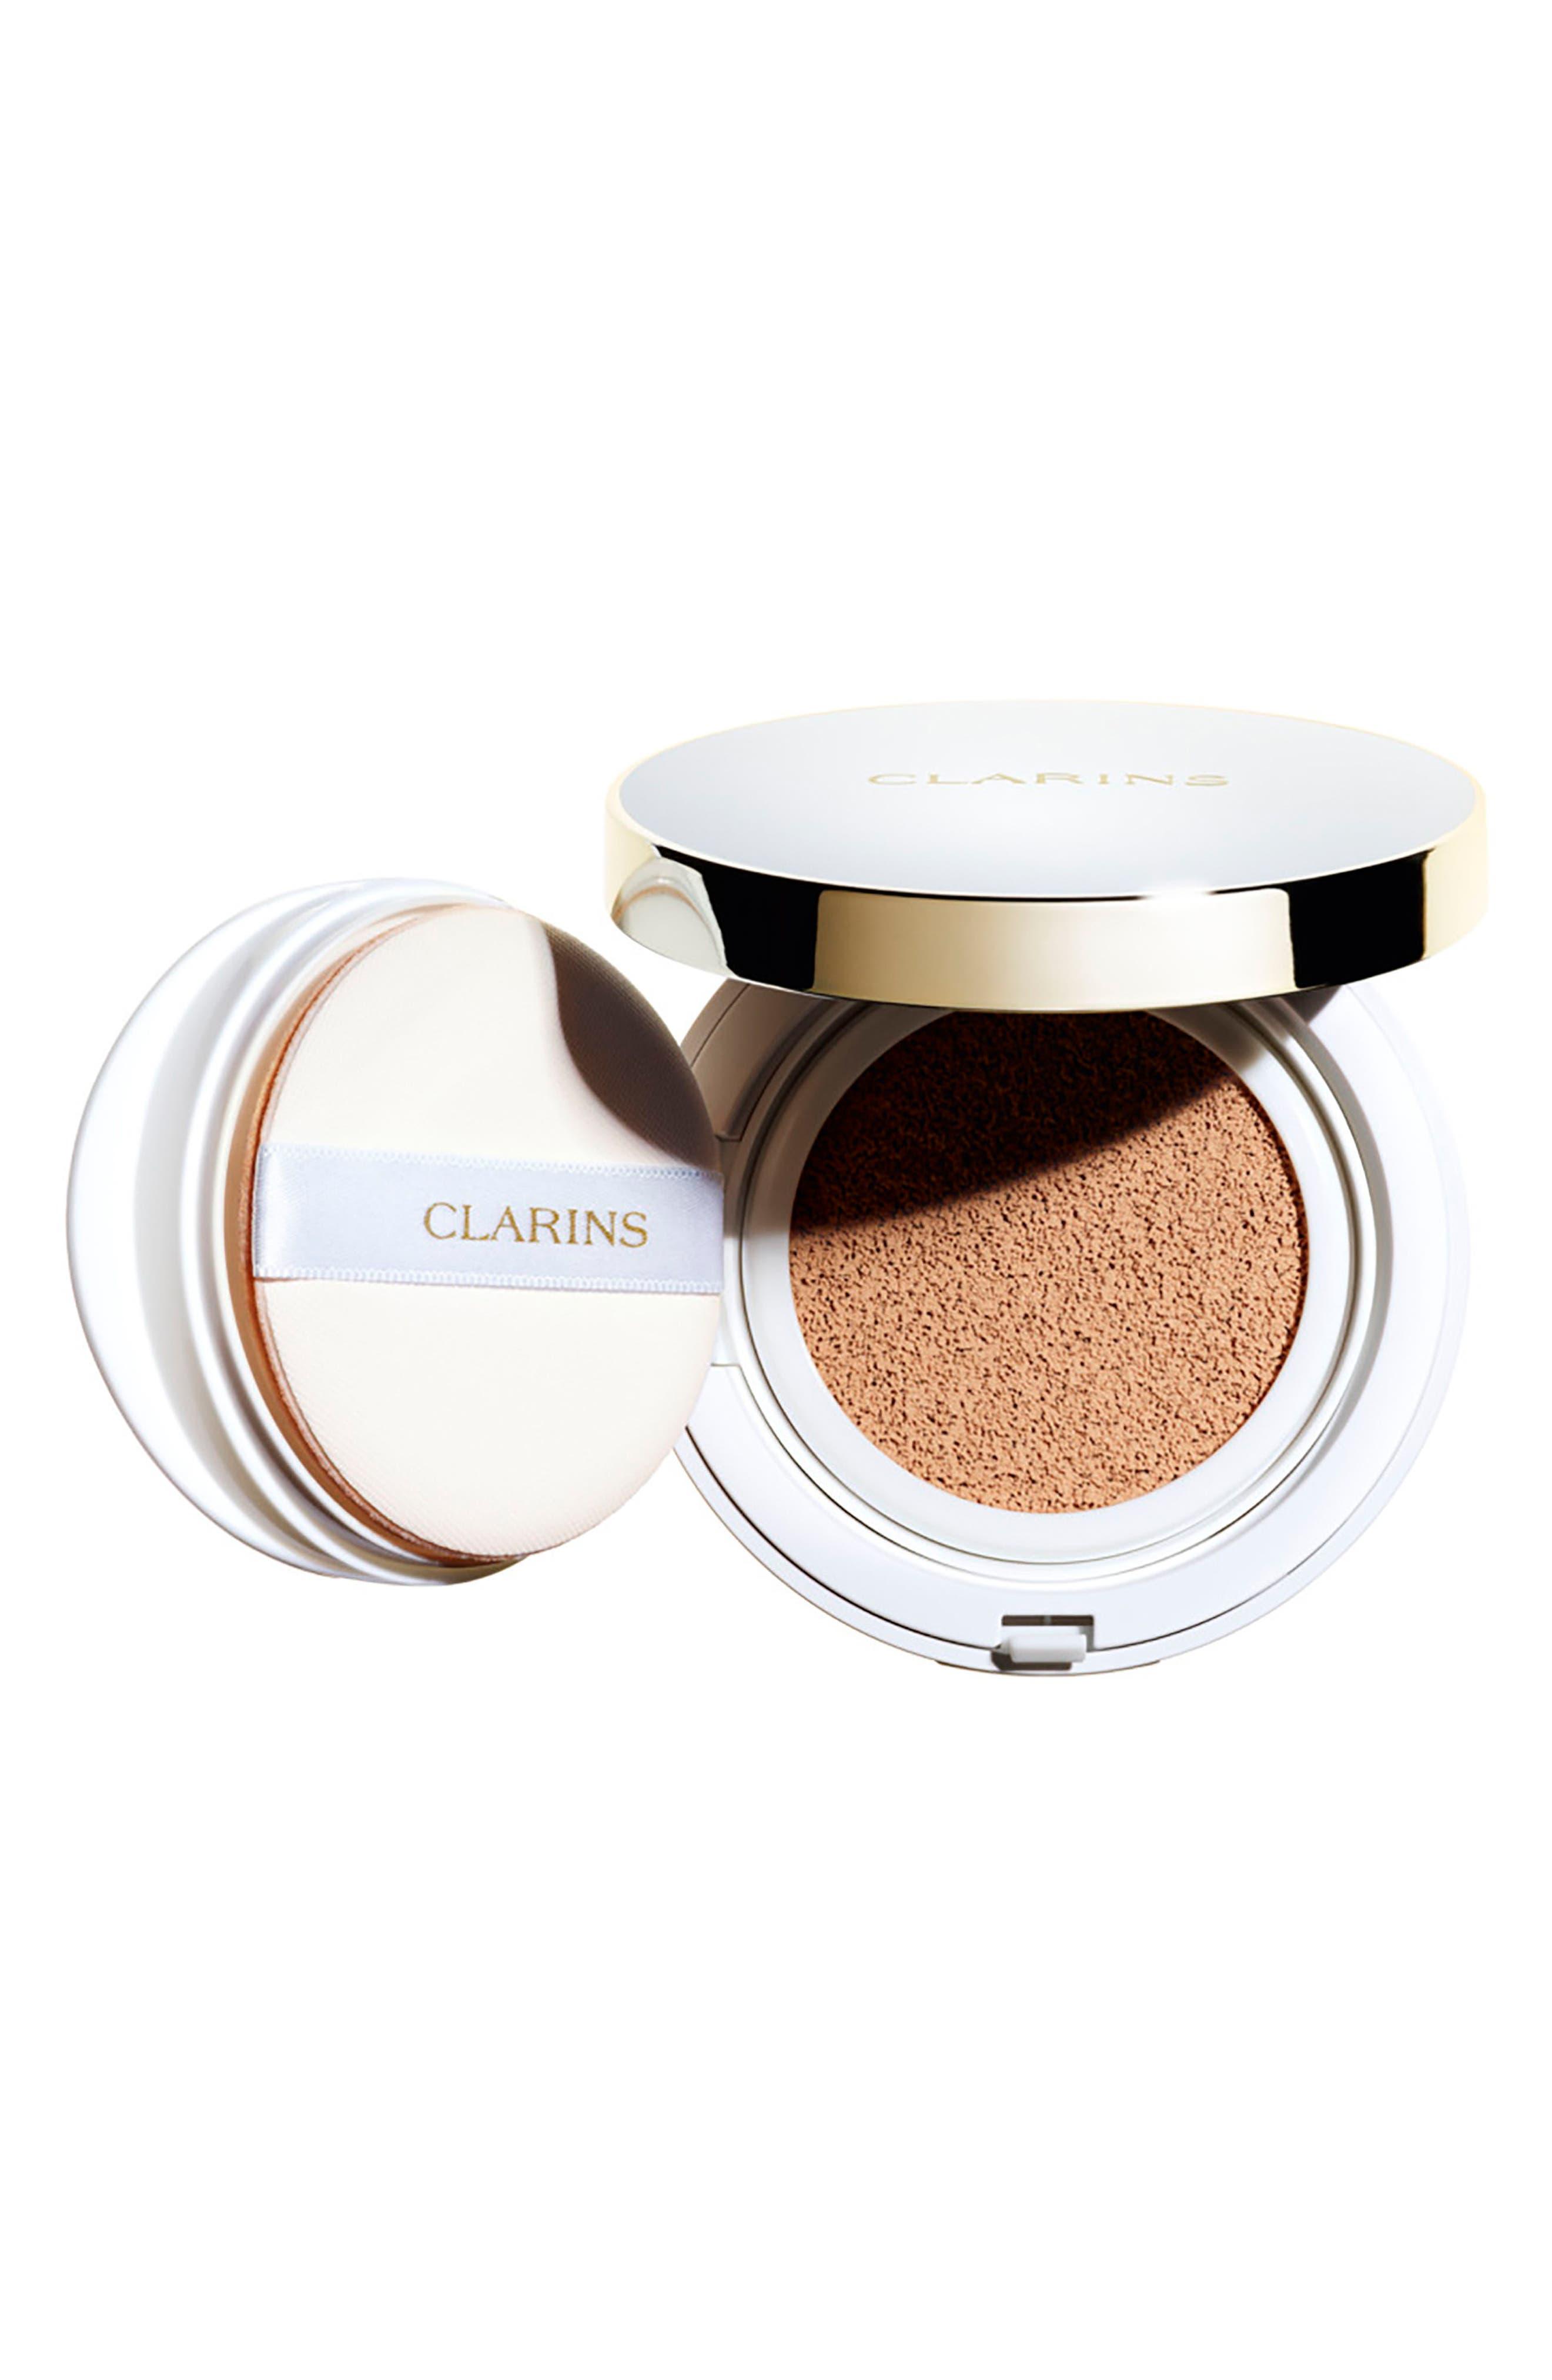 Clarins Everlasting Cushion Foundation SPF 50